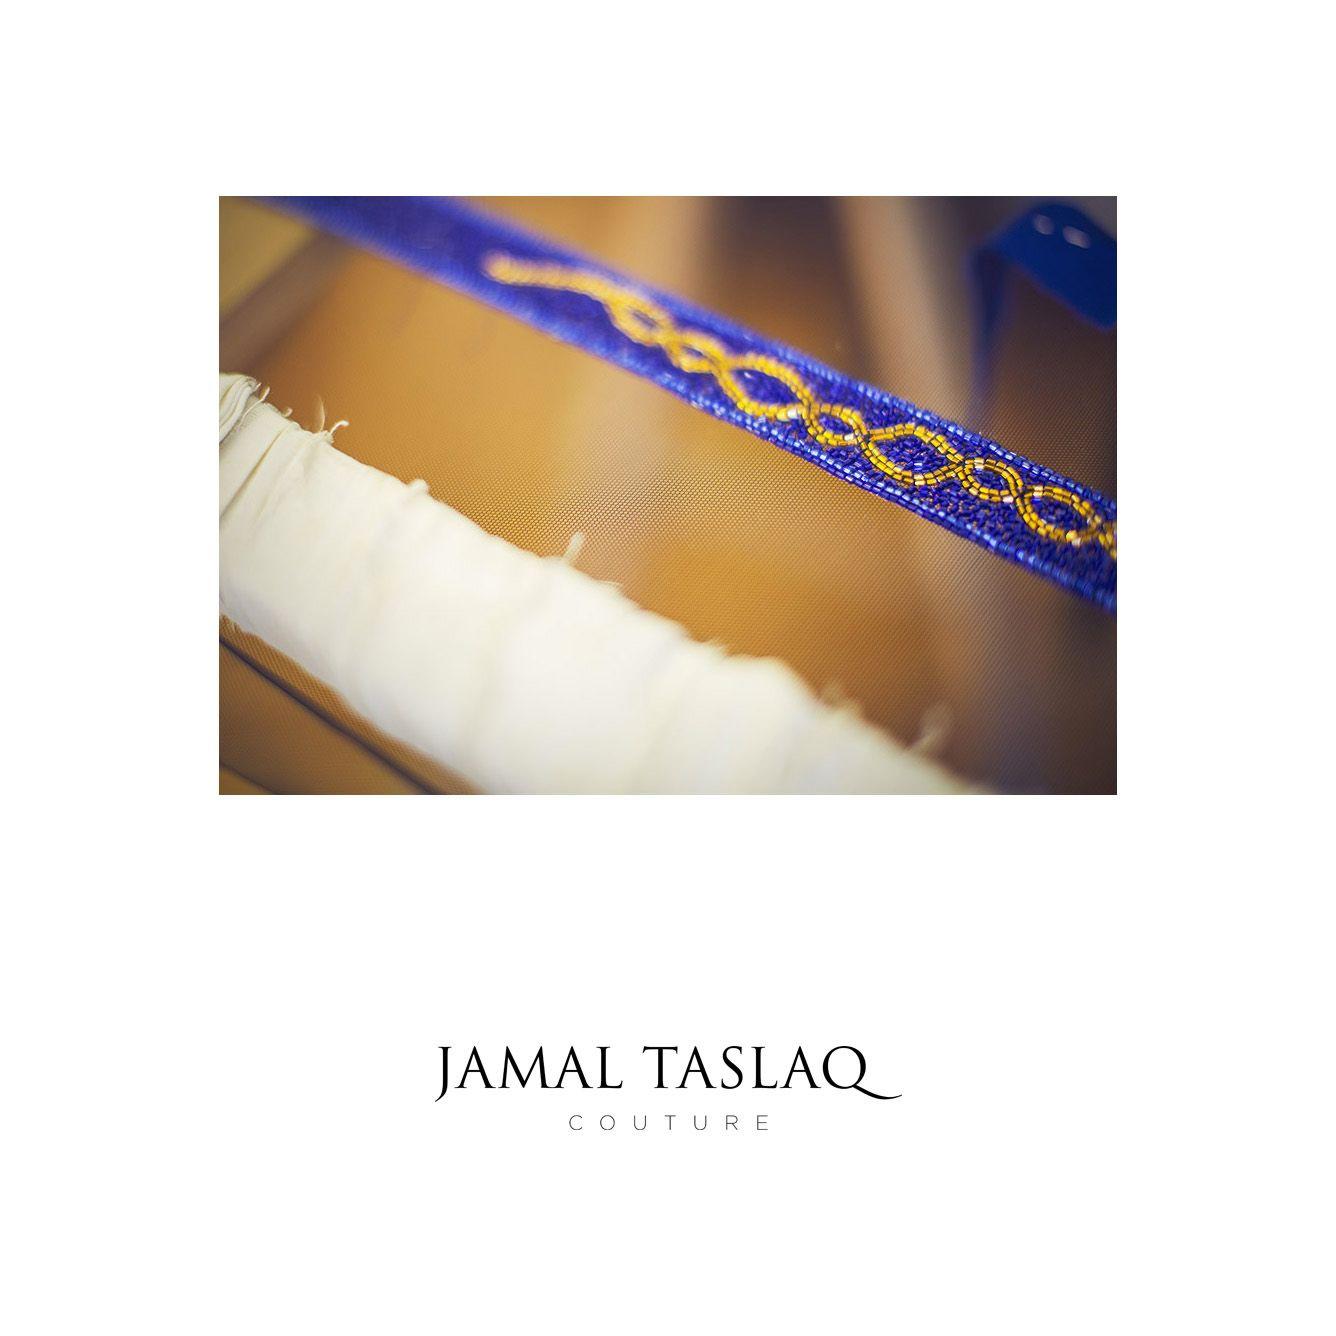 Jamal Taslaq, alta moda e abiti da sposa made in Italy